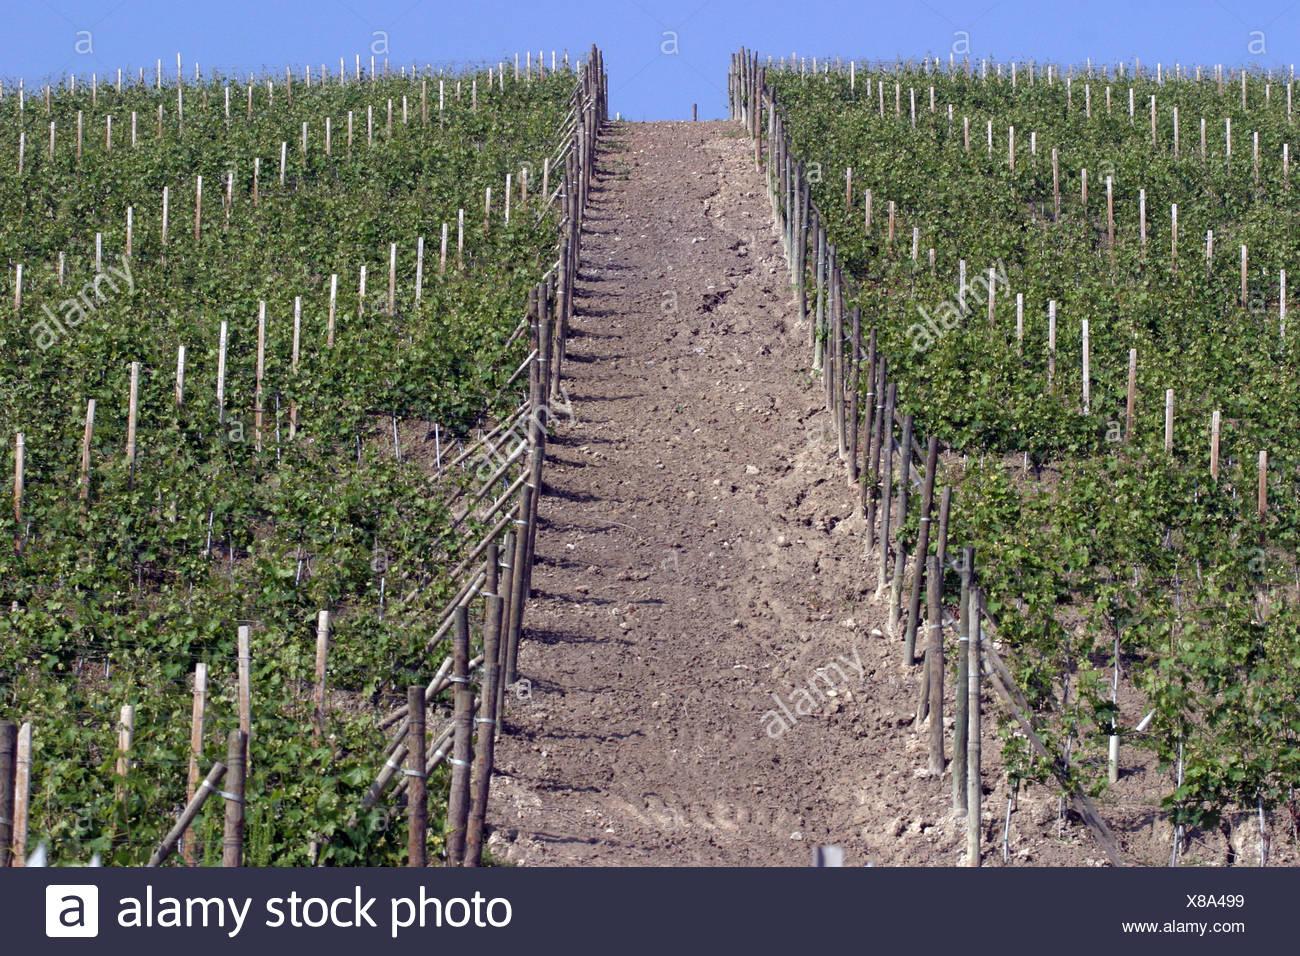 Italy, Tuscany, Vineyard - Stock Image